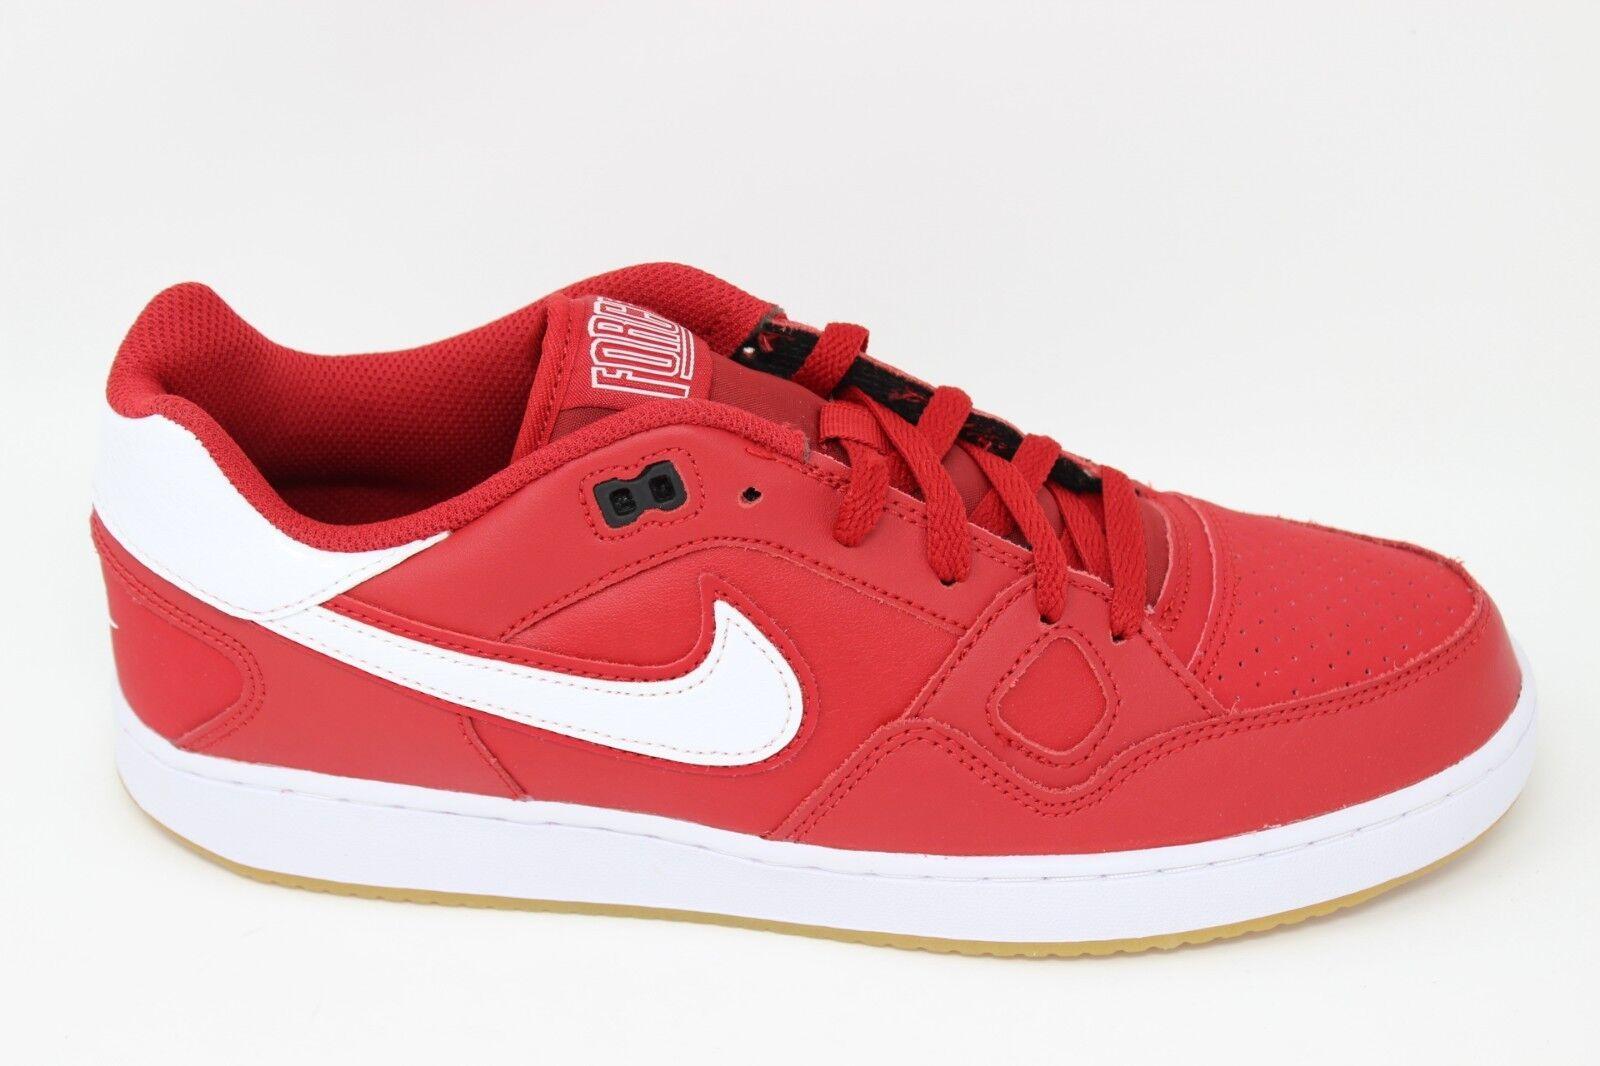 Nike Men's Son Of Force 616775 619 Red White-Black-Gum Brand New In Box